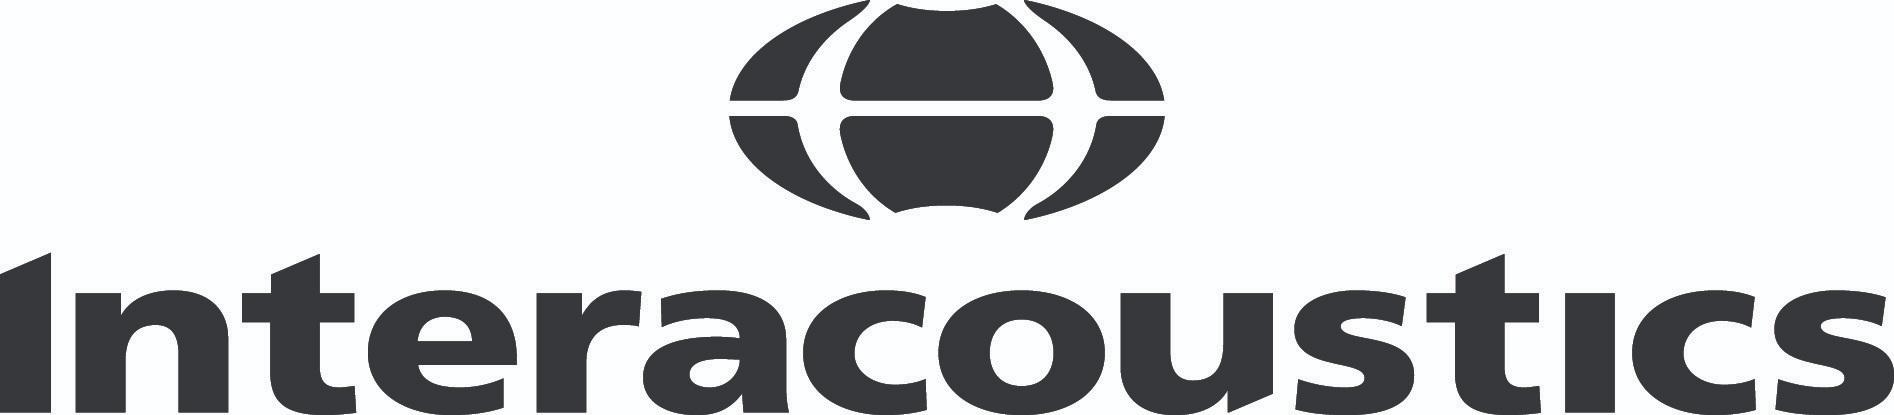 Interacoustics-logo.jpg